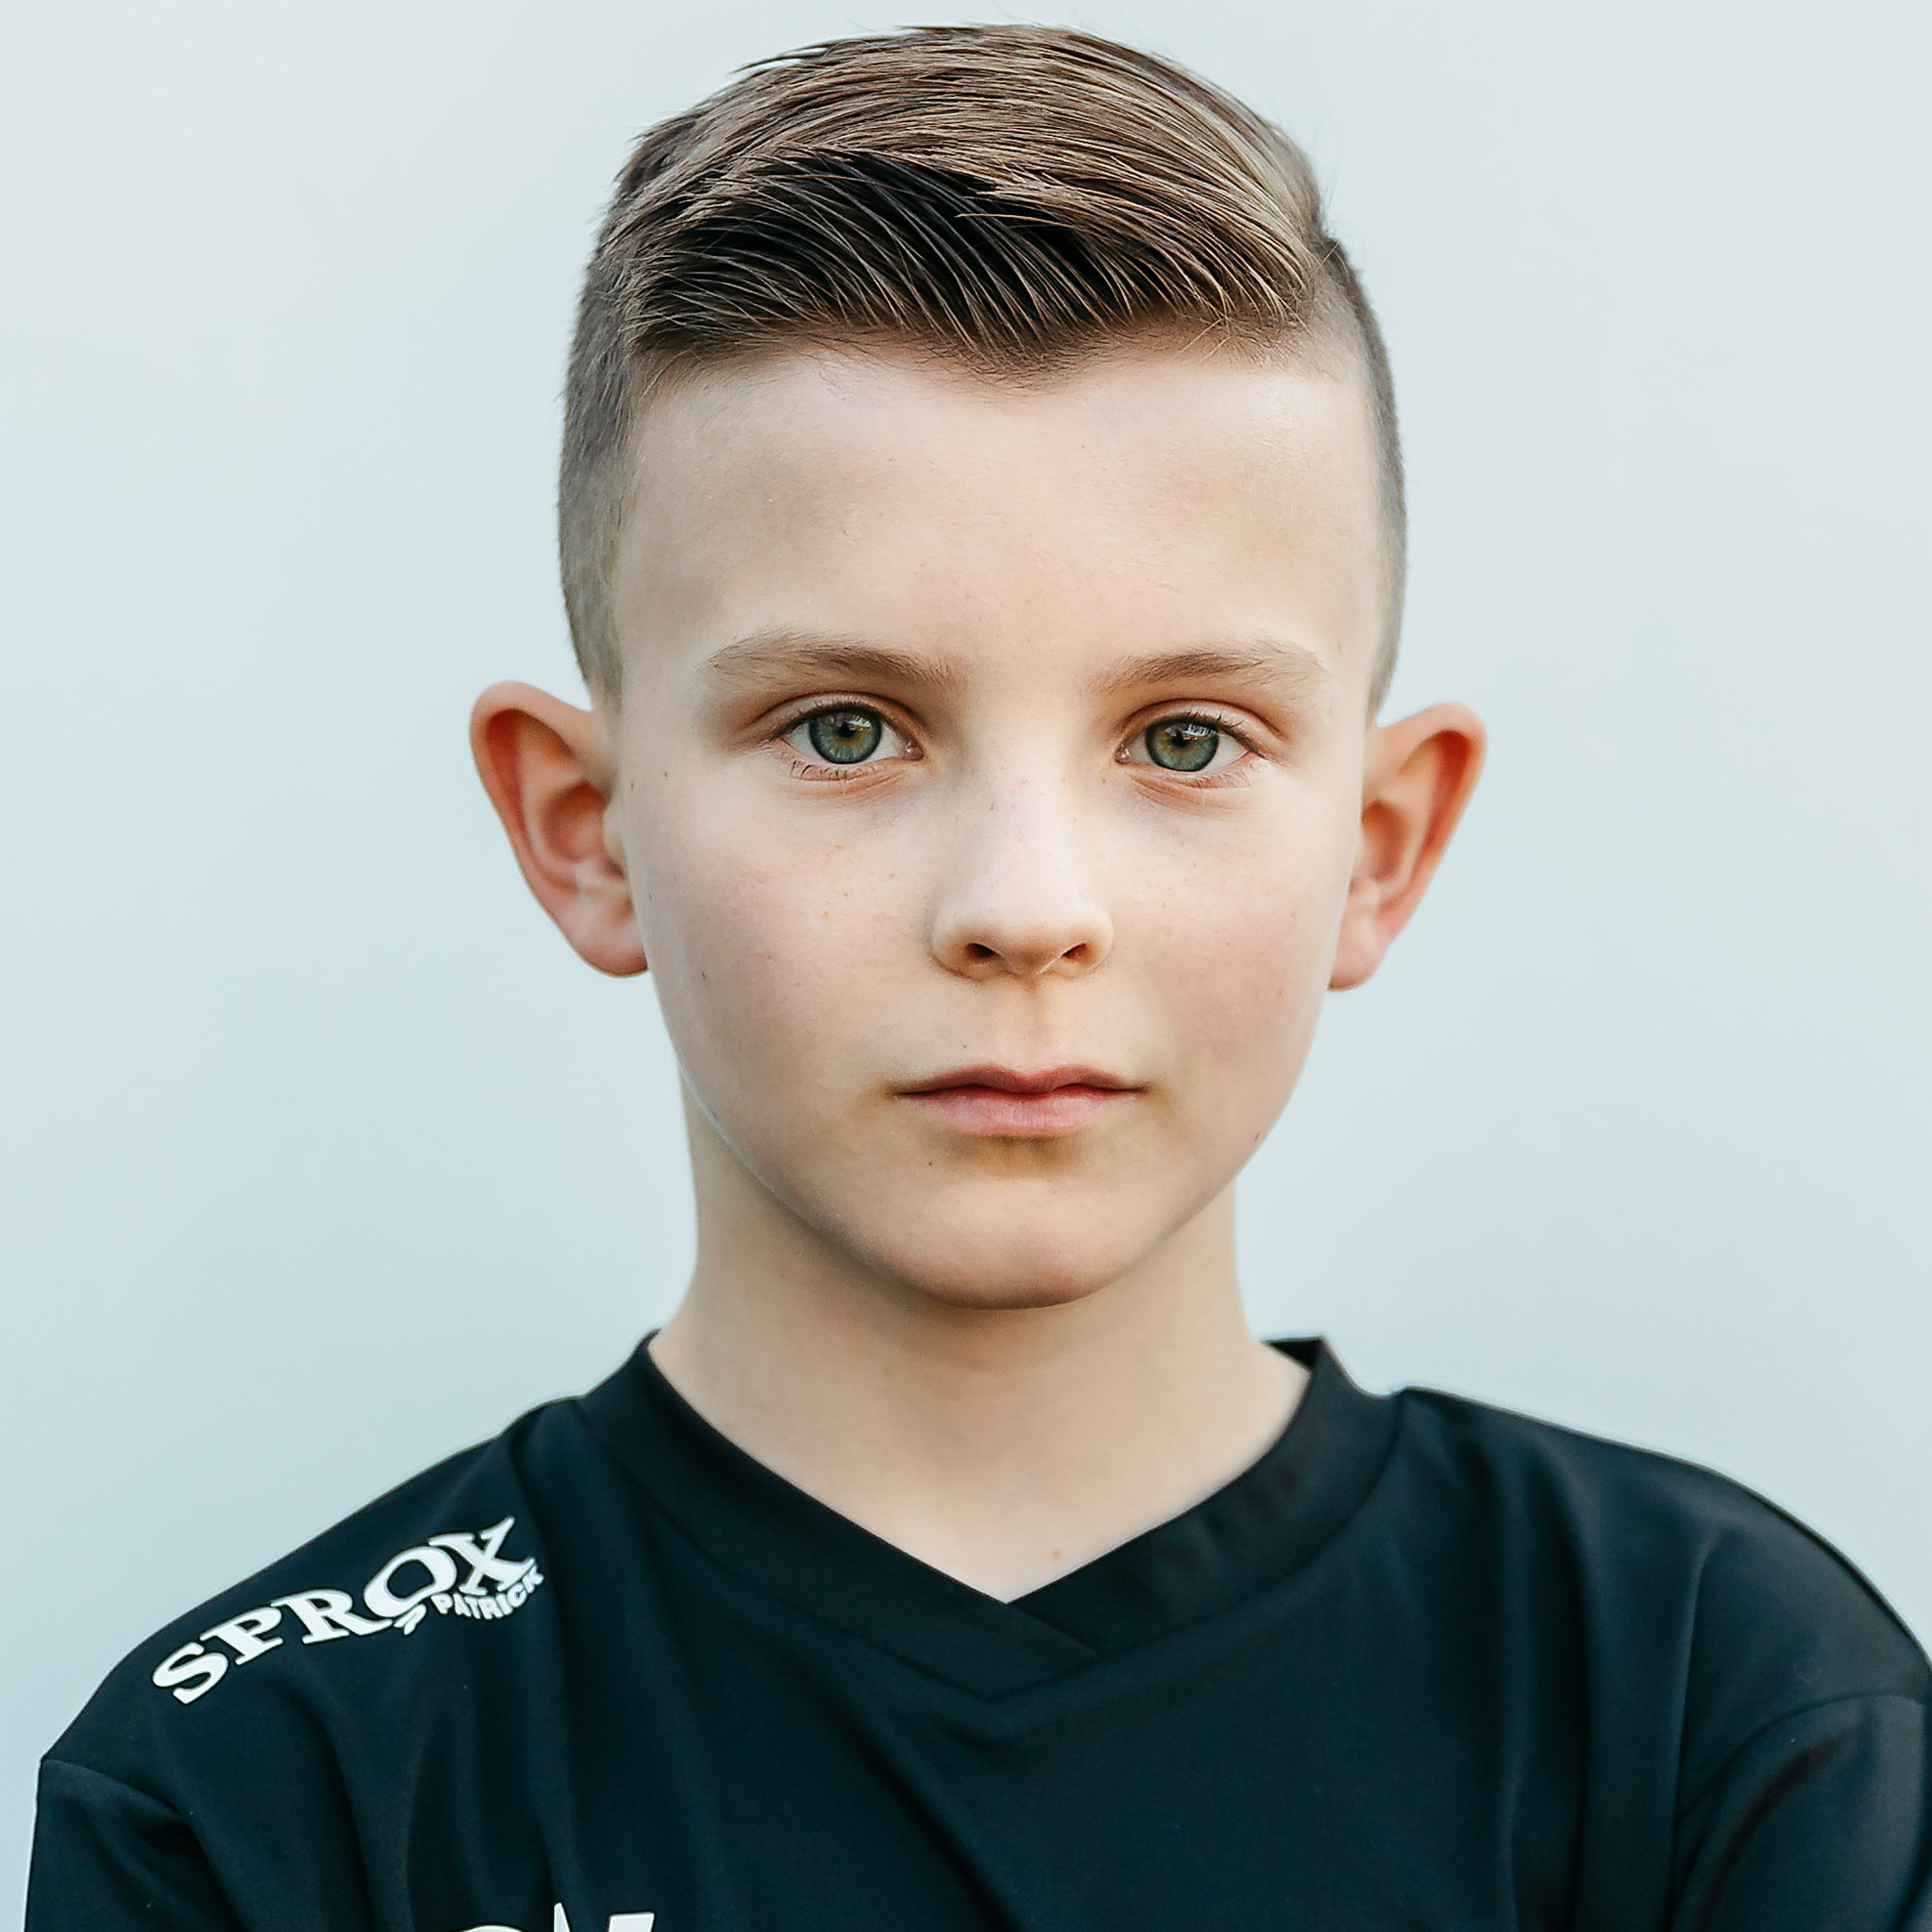 https://socceracademybreda.nl/wp-content/uploads/2019/05/SAB-Danie_002-e1568213825816.jpg